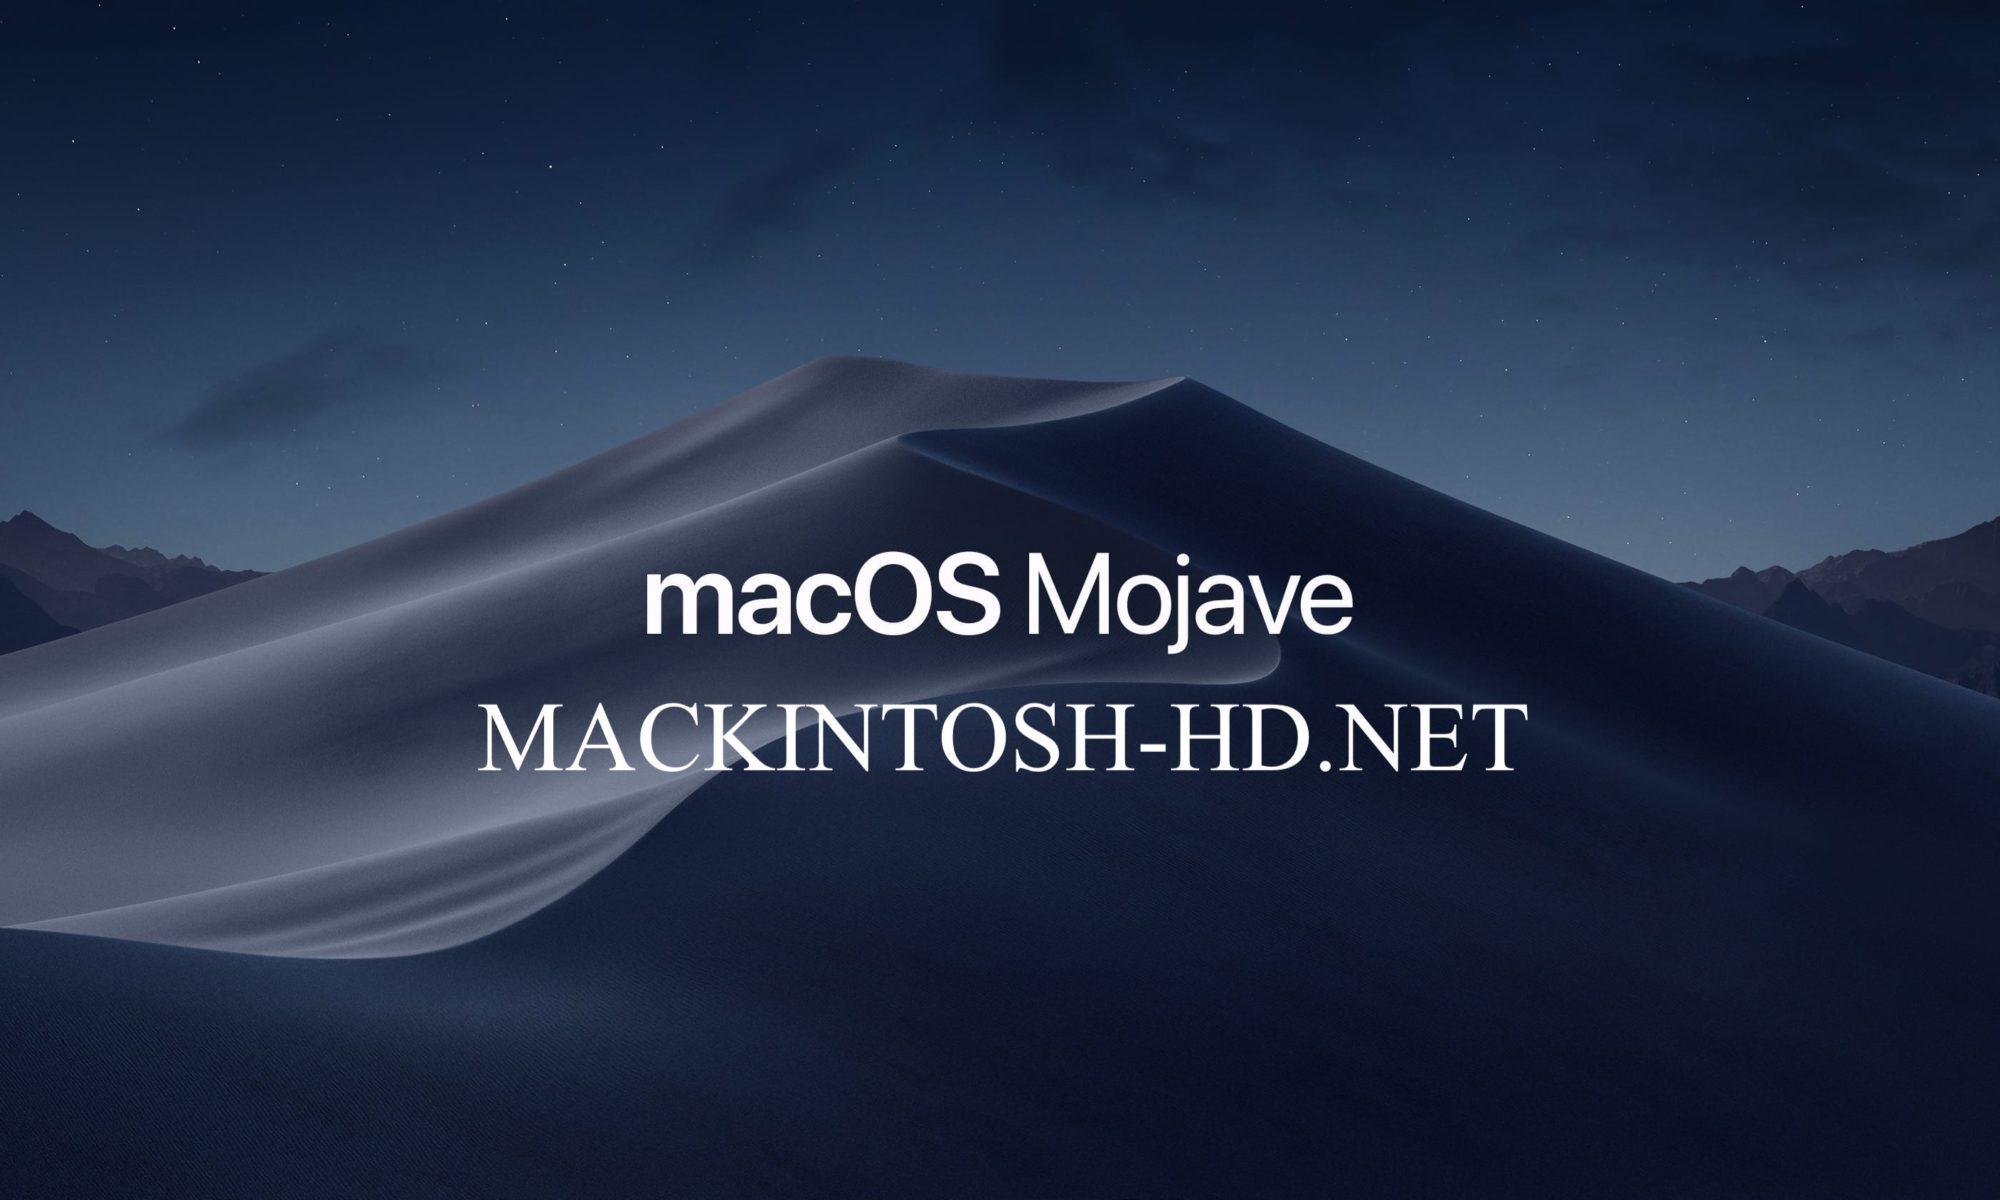 macos mojave bootable usb windows 10